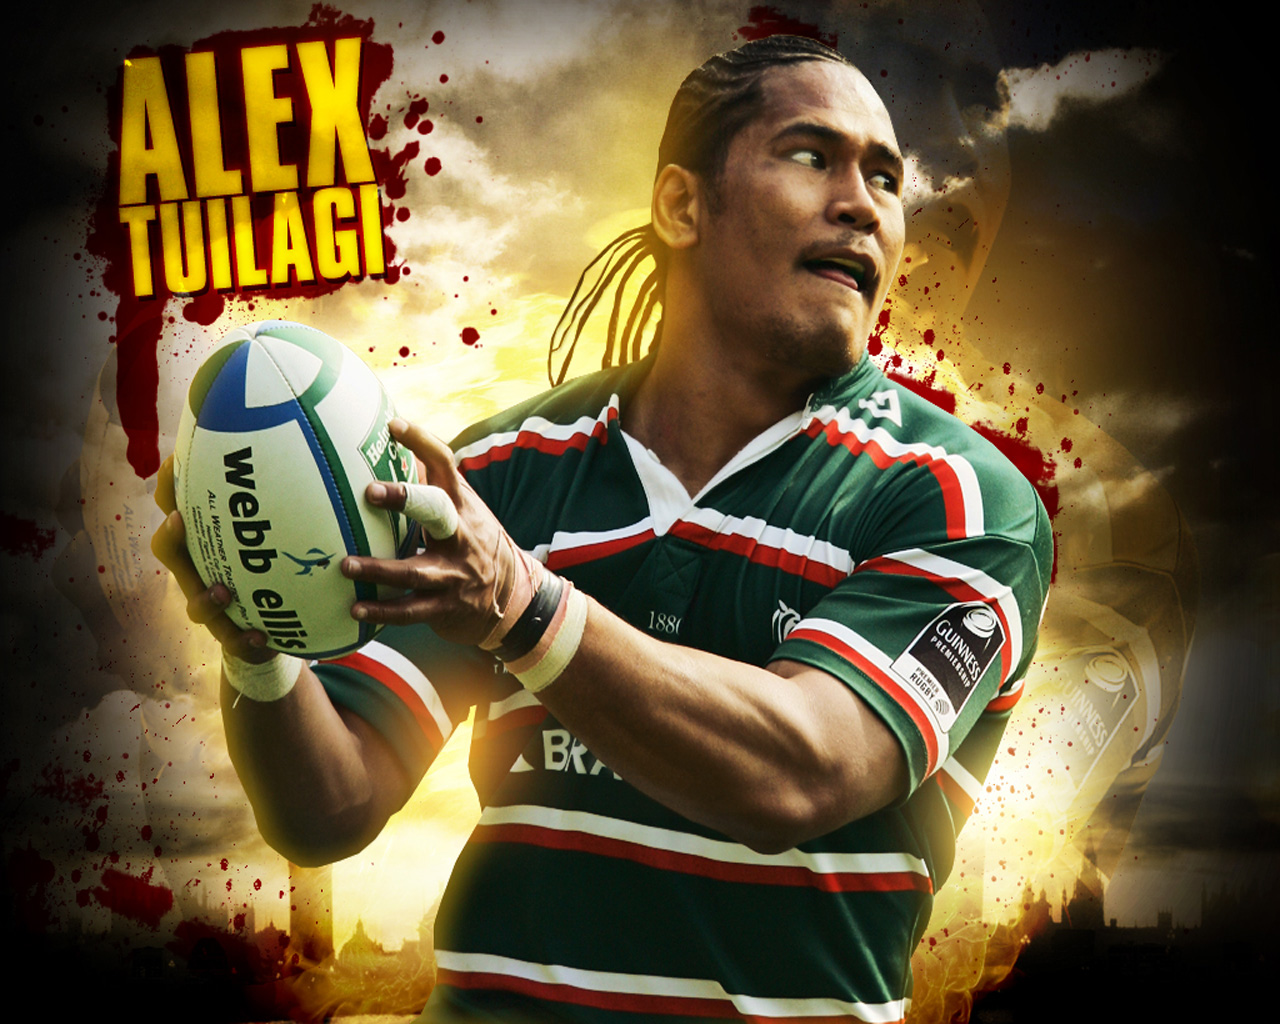 Tuilagi Rugby Player Wallpaper Alex Tuilagi Rugby 1280x1024